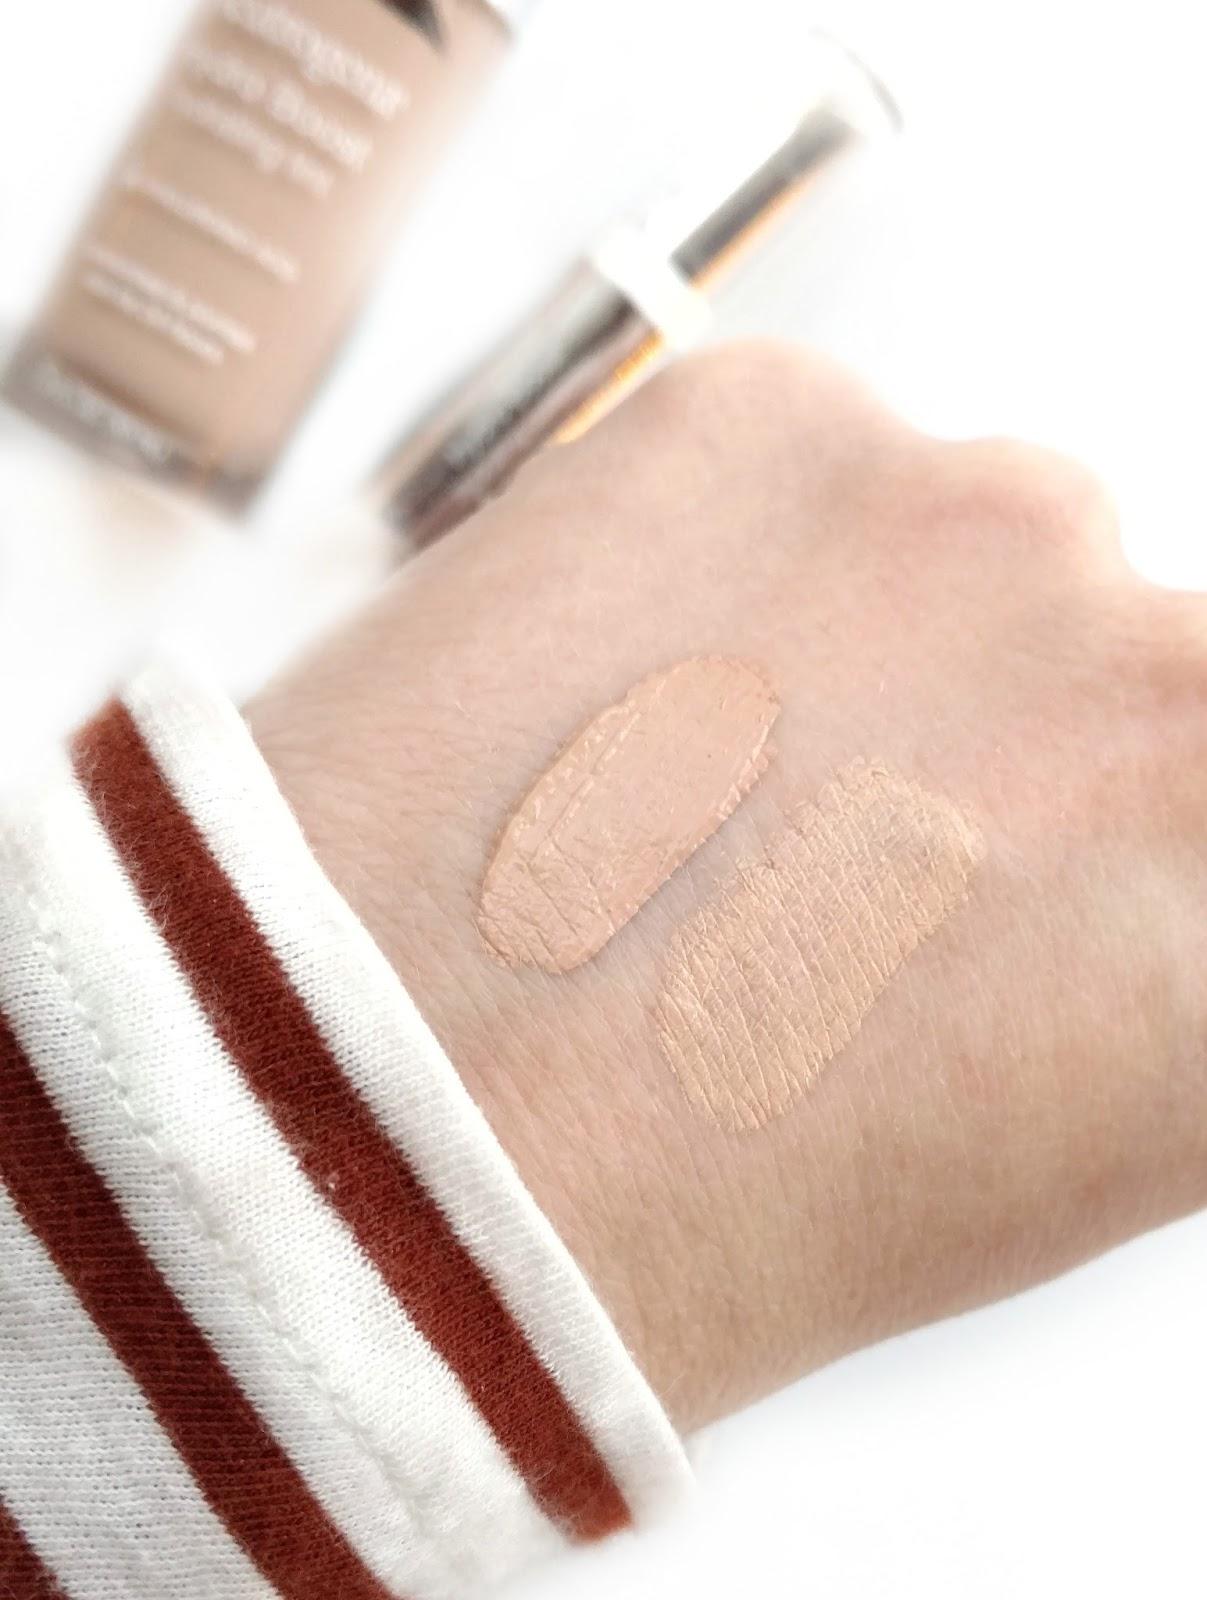 Hydro Boost Hydrating Tint by Neutrogena #13